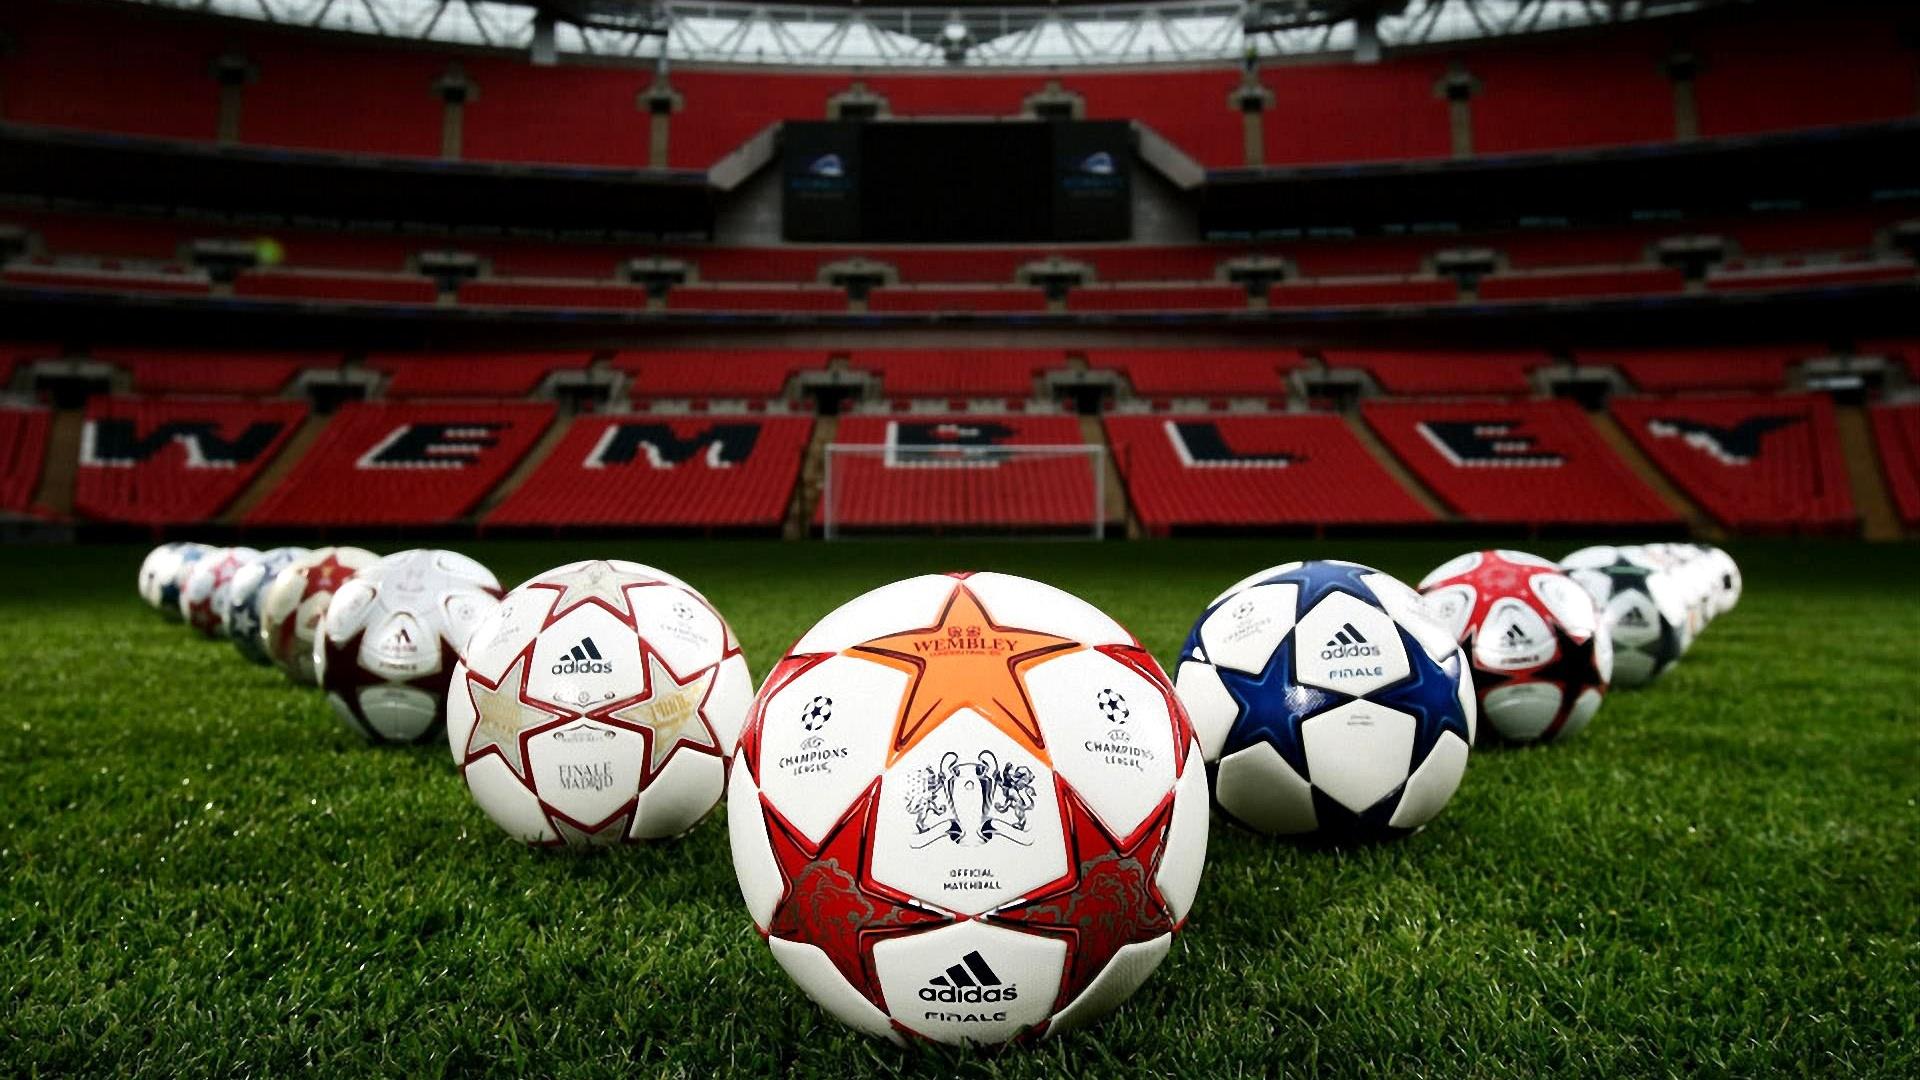 Hd Soccer Wallpapers 1080p Download Wallpaper DaWallpaperz 1920x1080